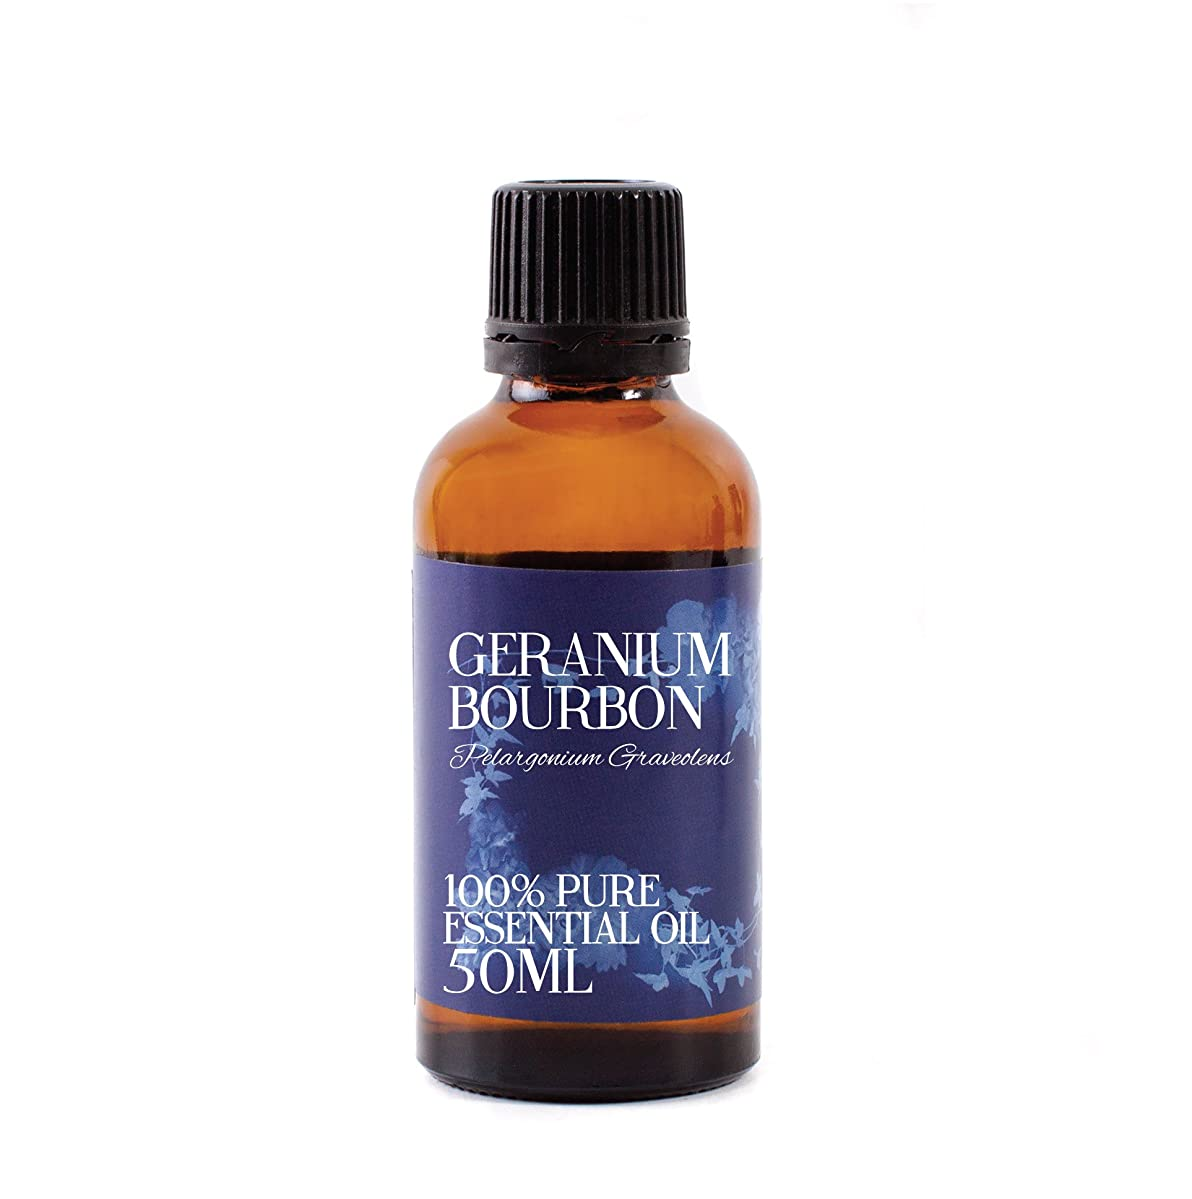 Mystic Moments | Geranium Bourbon Essential Oil - 50ml - 100% Pure